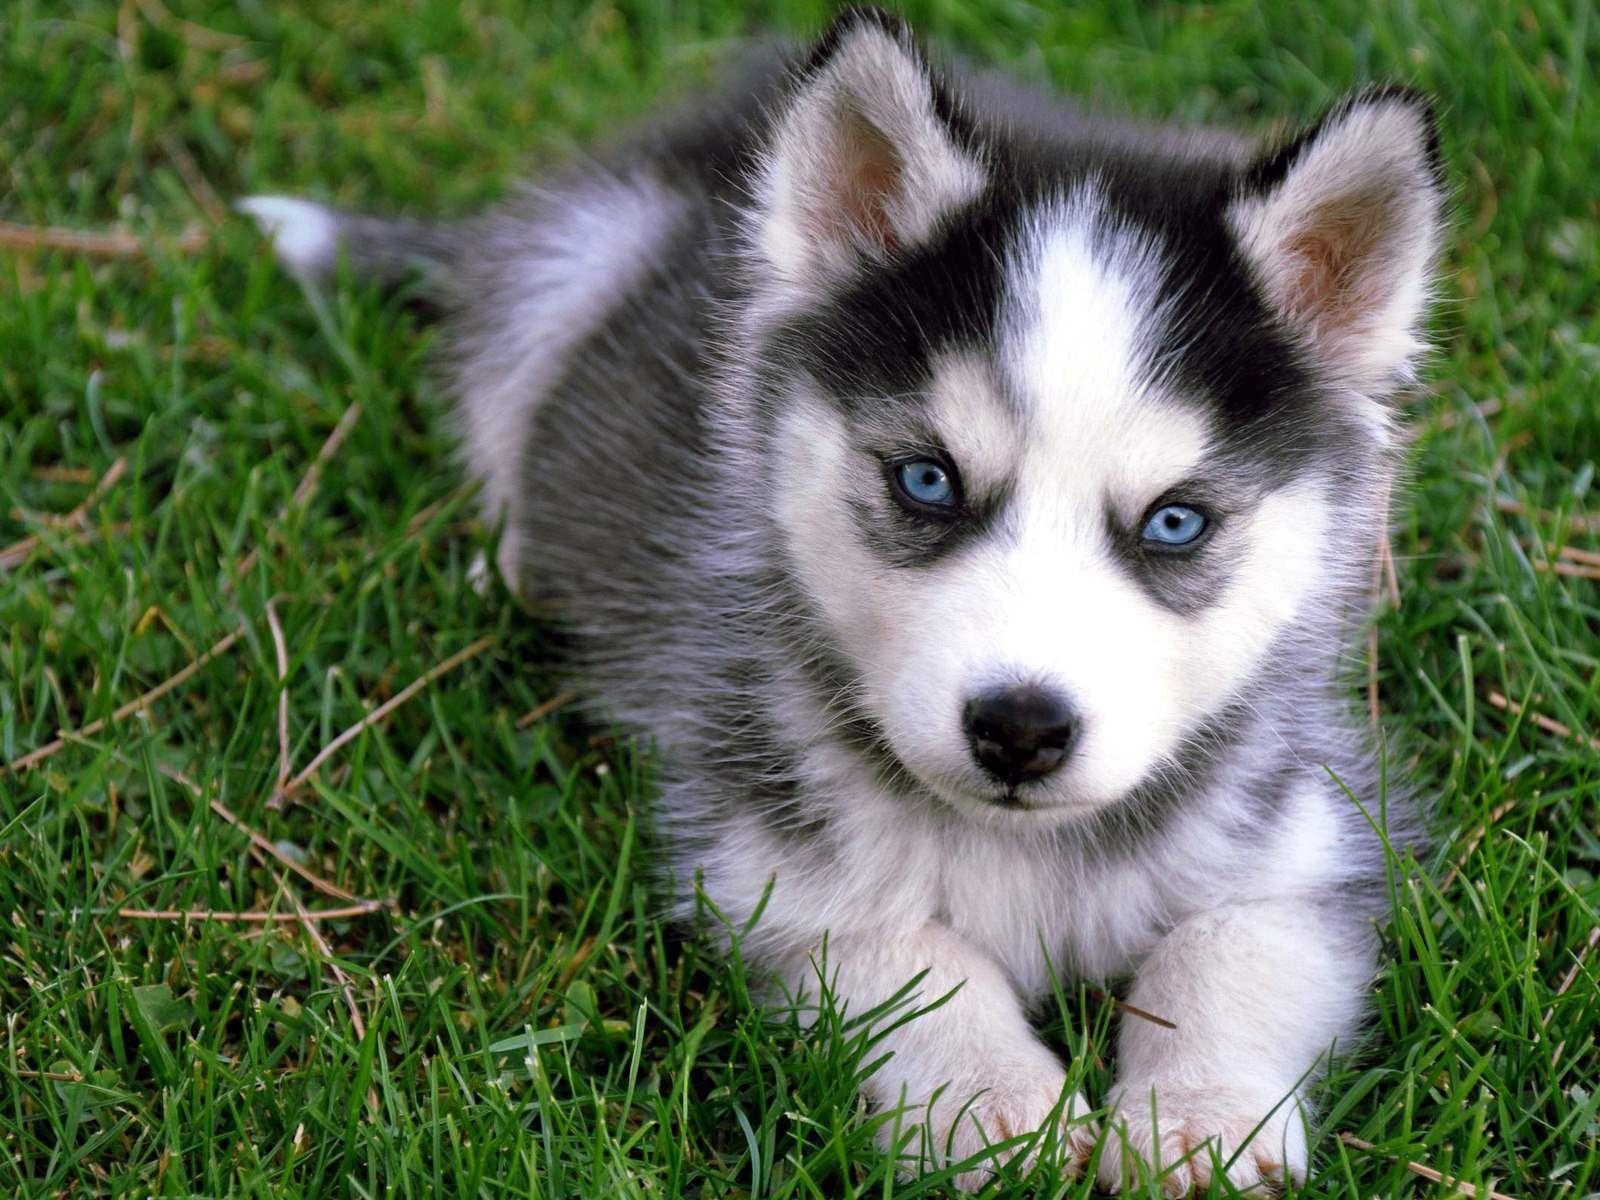 Cute+Husky+Puppies | Cute Siberian Husky Puppy Sitting On Grass ...